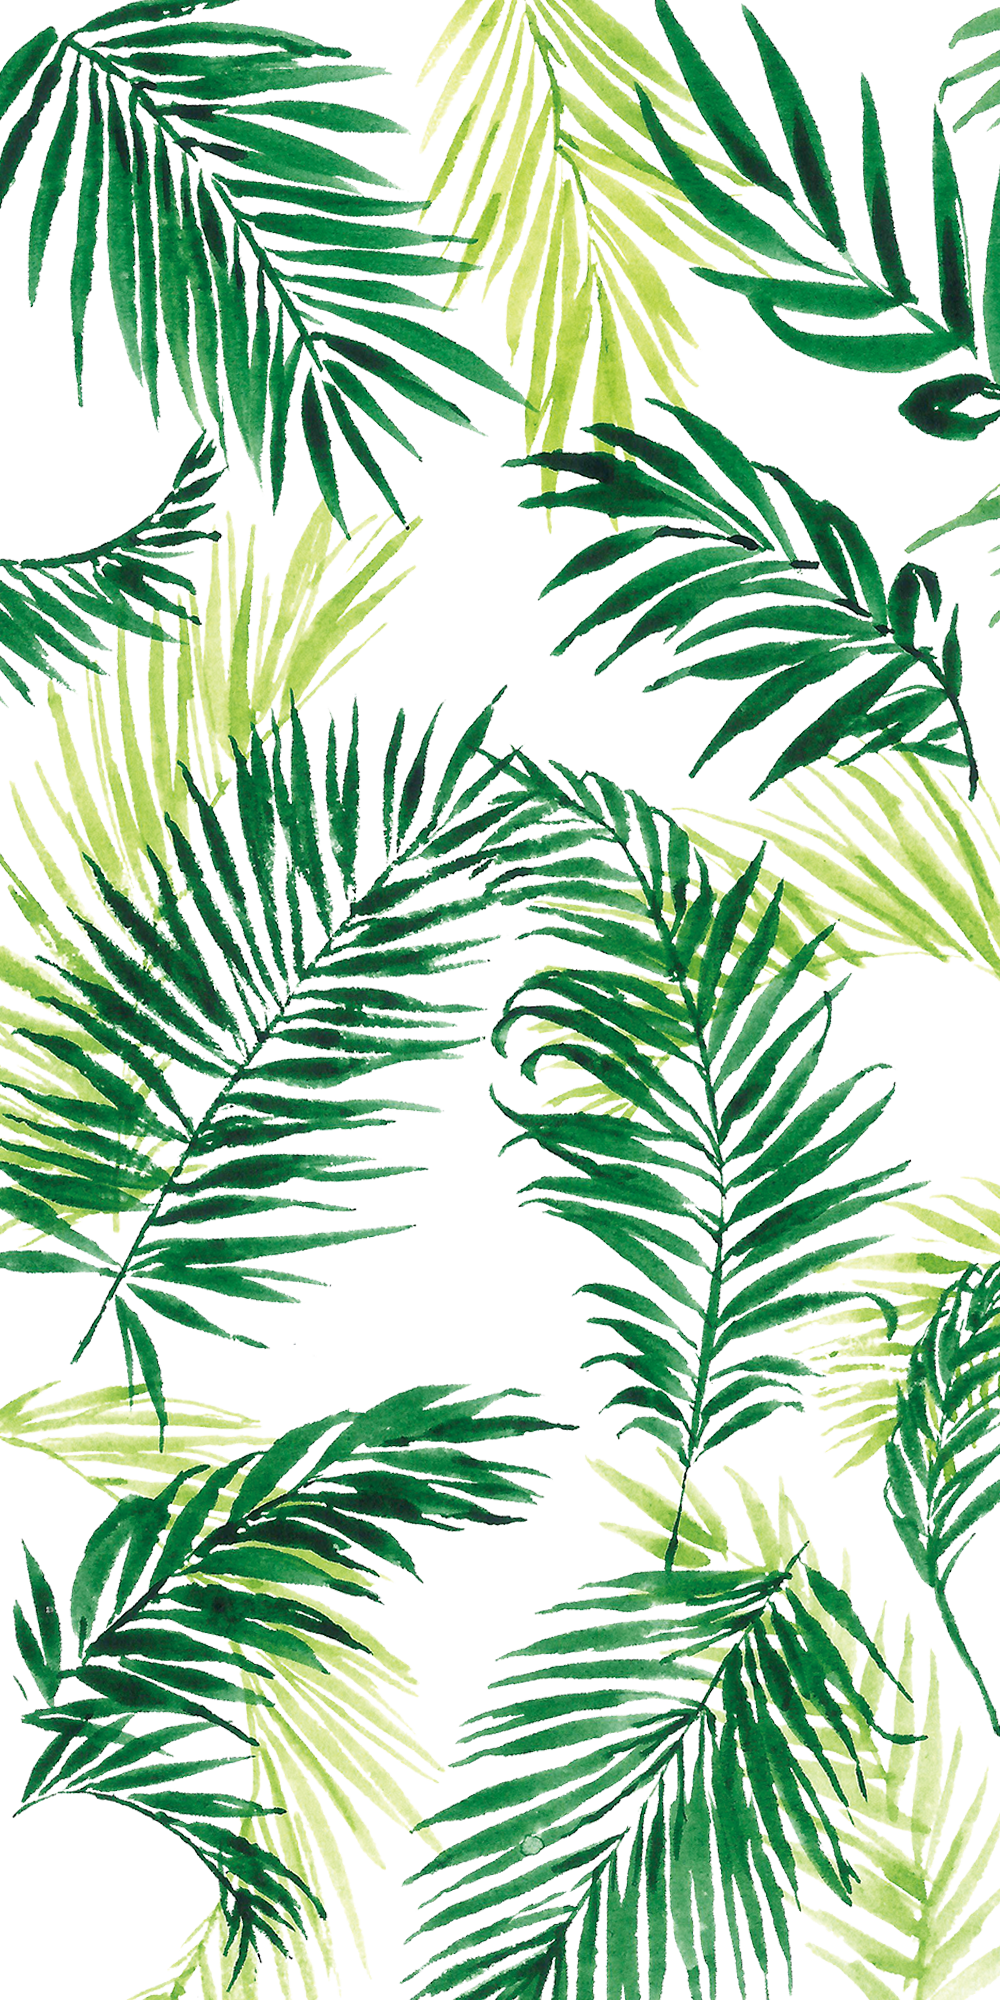 Leaves Greens Green Nature Botanical Casetify Iphone Phone Case Cases Art Design Illust Iphone Background Wallpaper Plant Wallpaper Leaf Wallpaper